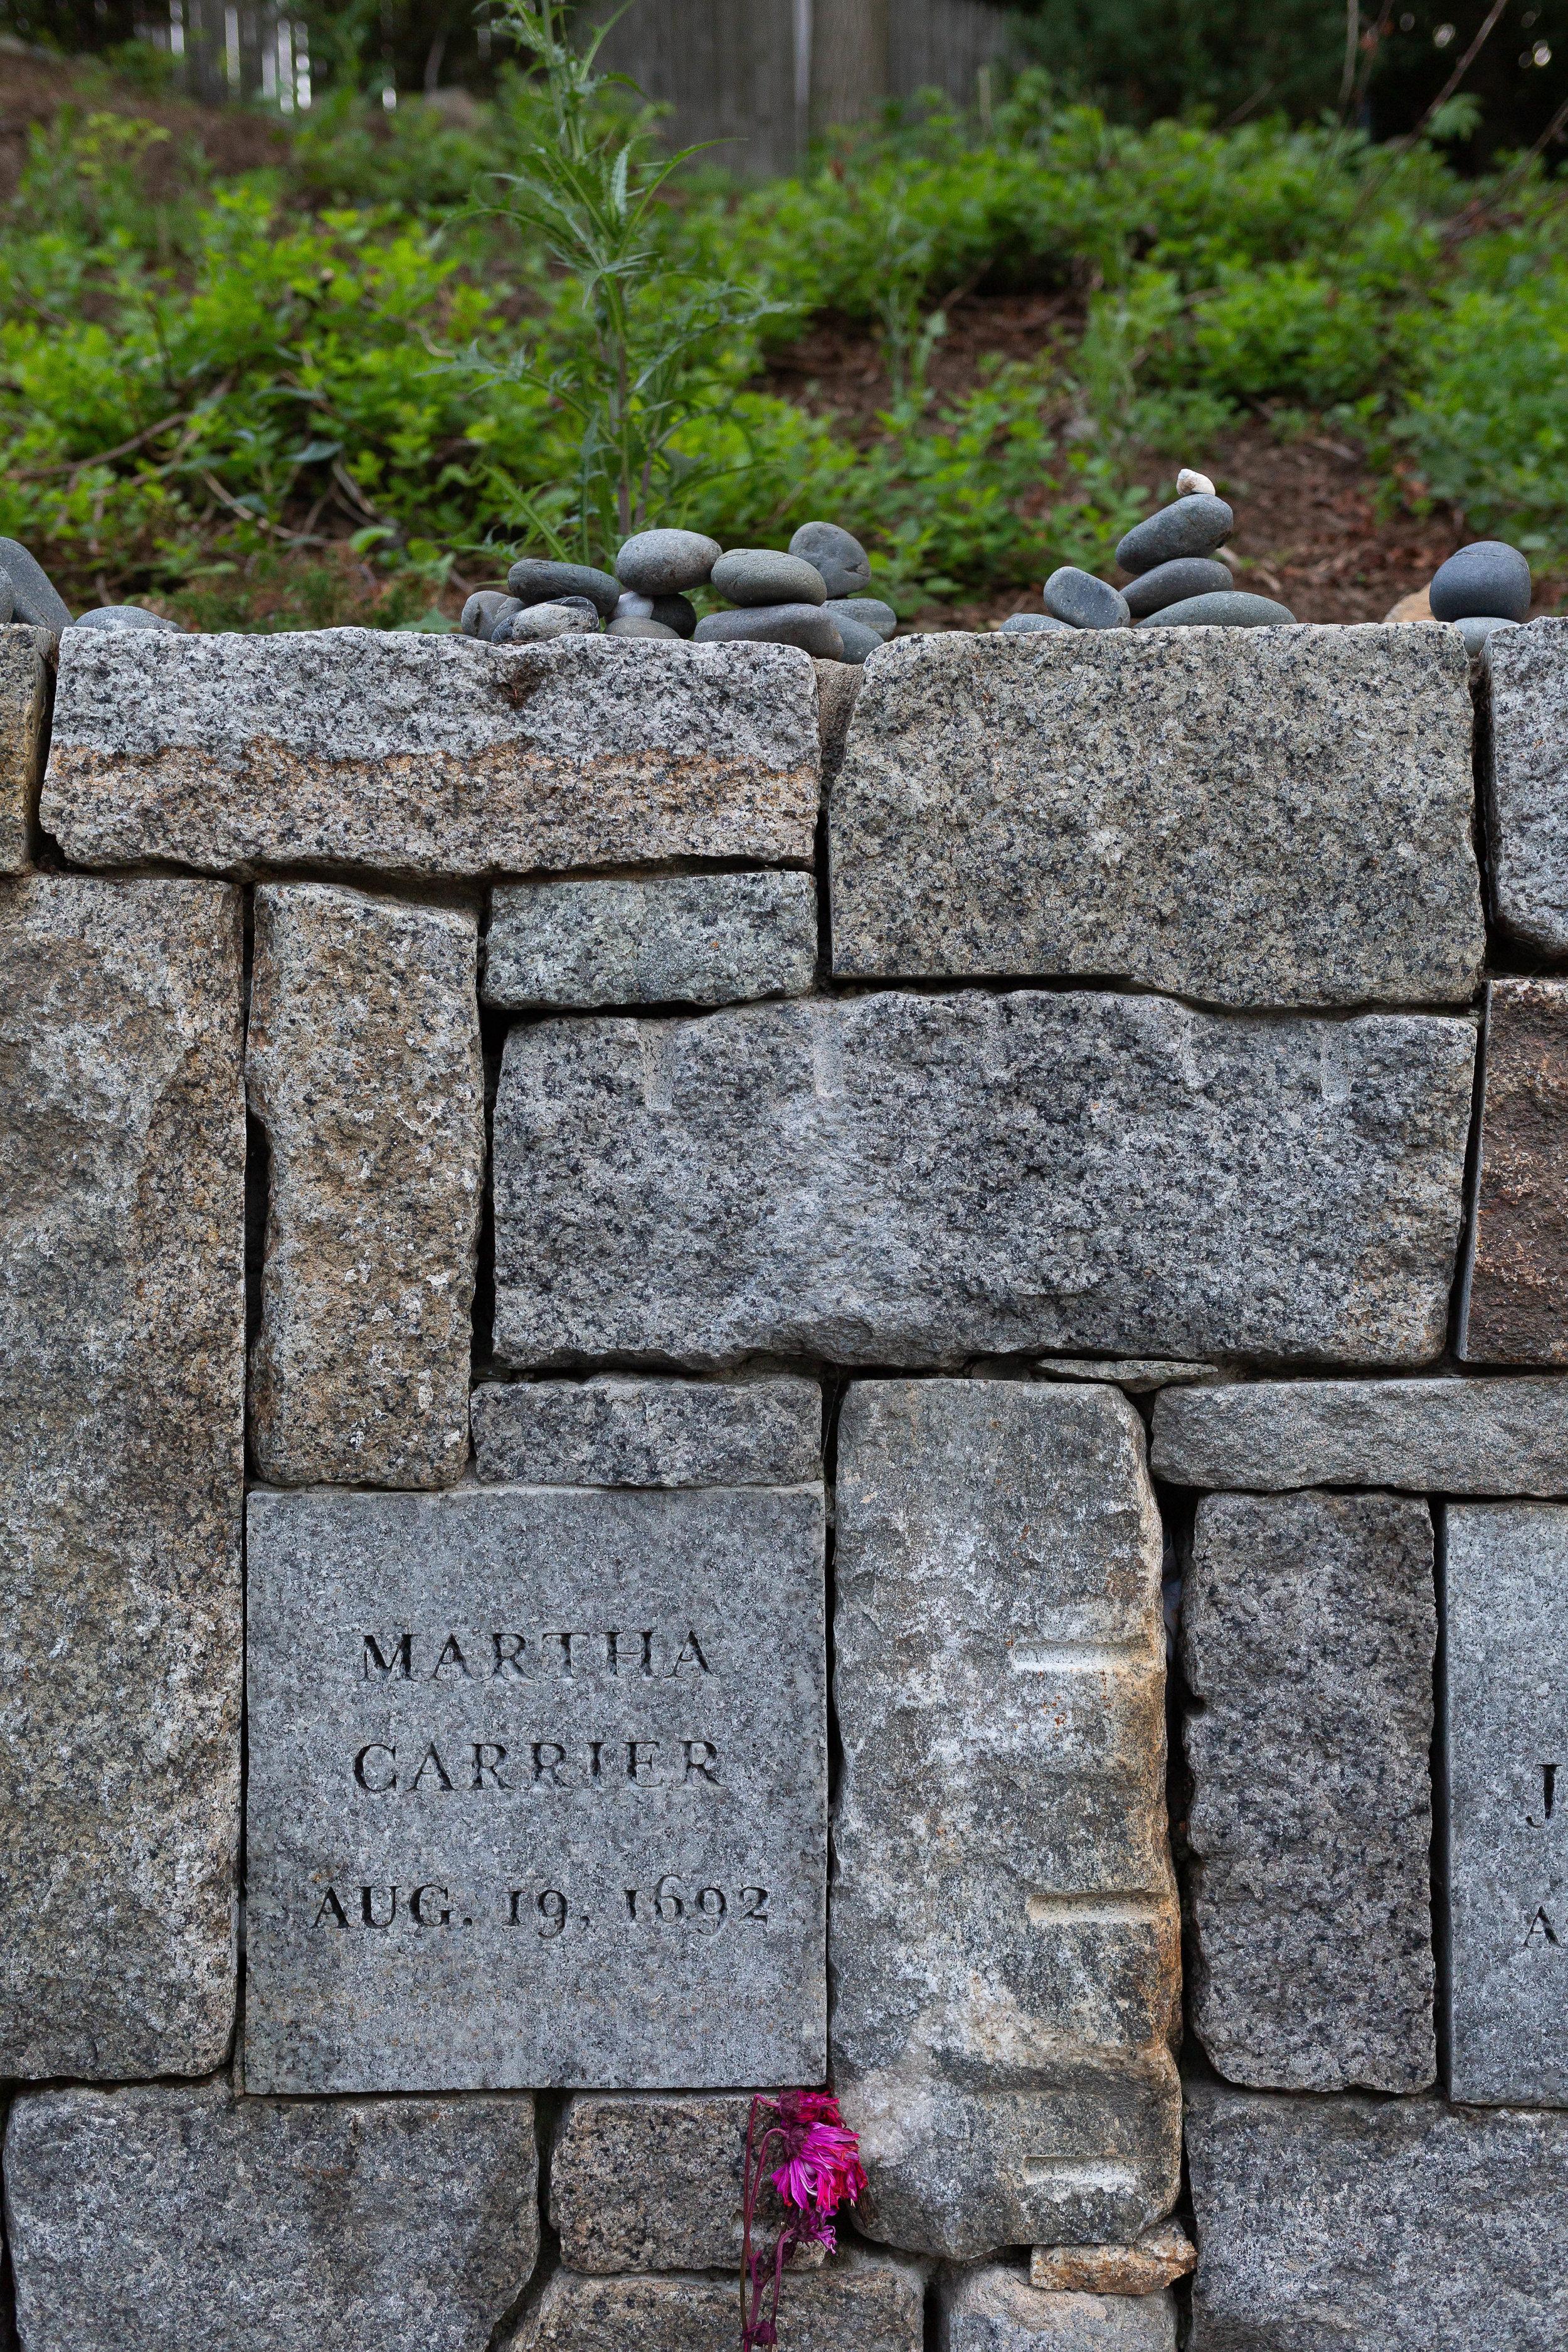 Proctor's Ledge Memorial, Salem, Massachusetts. Dedicated 2017